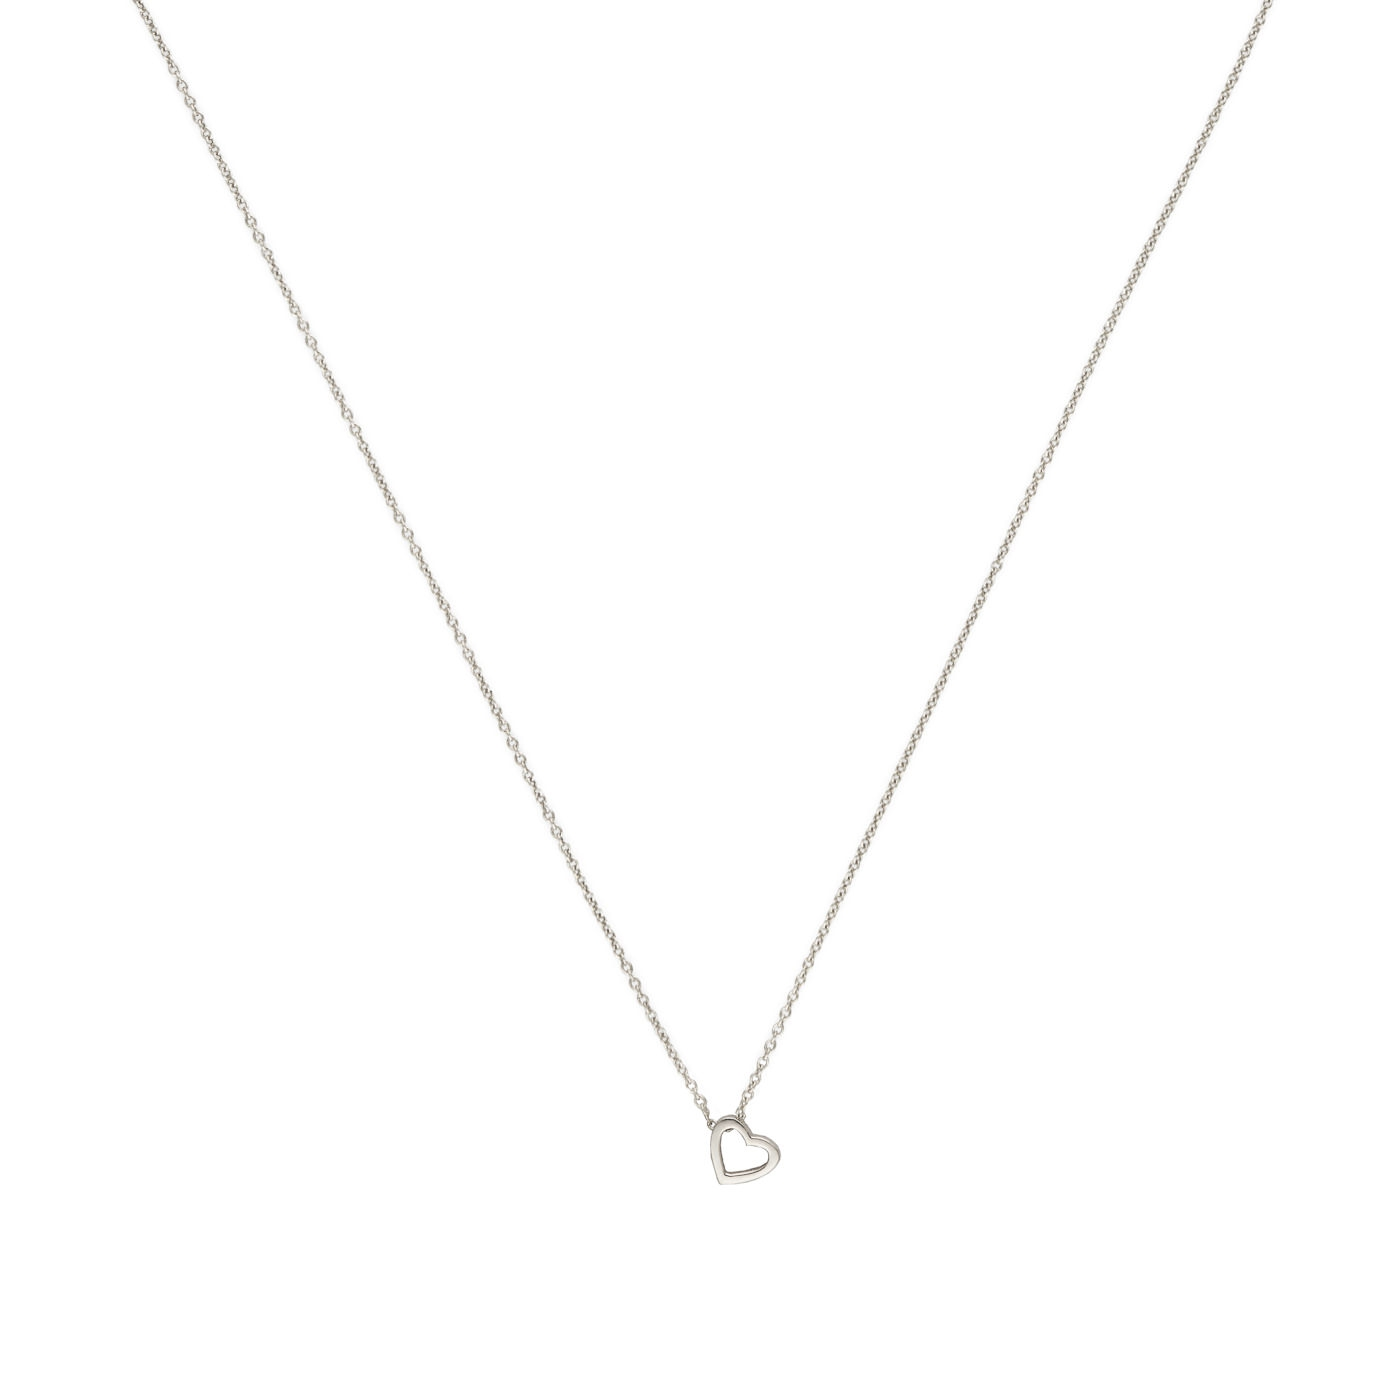 Abbildung von Minitials 18 Carat Gold White gold Colored Signature Open Heart Necklace